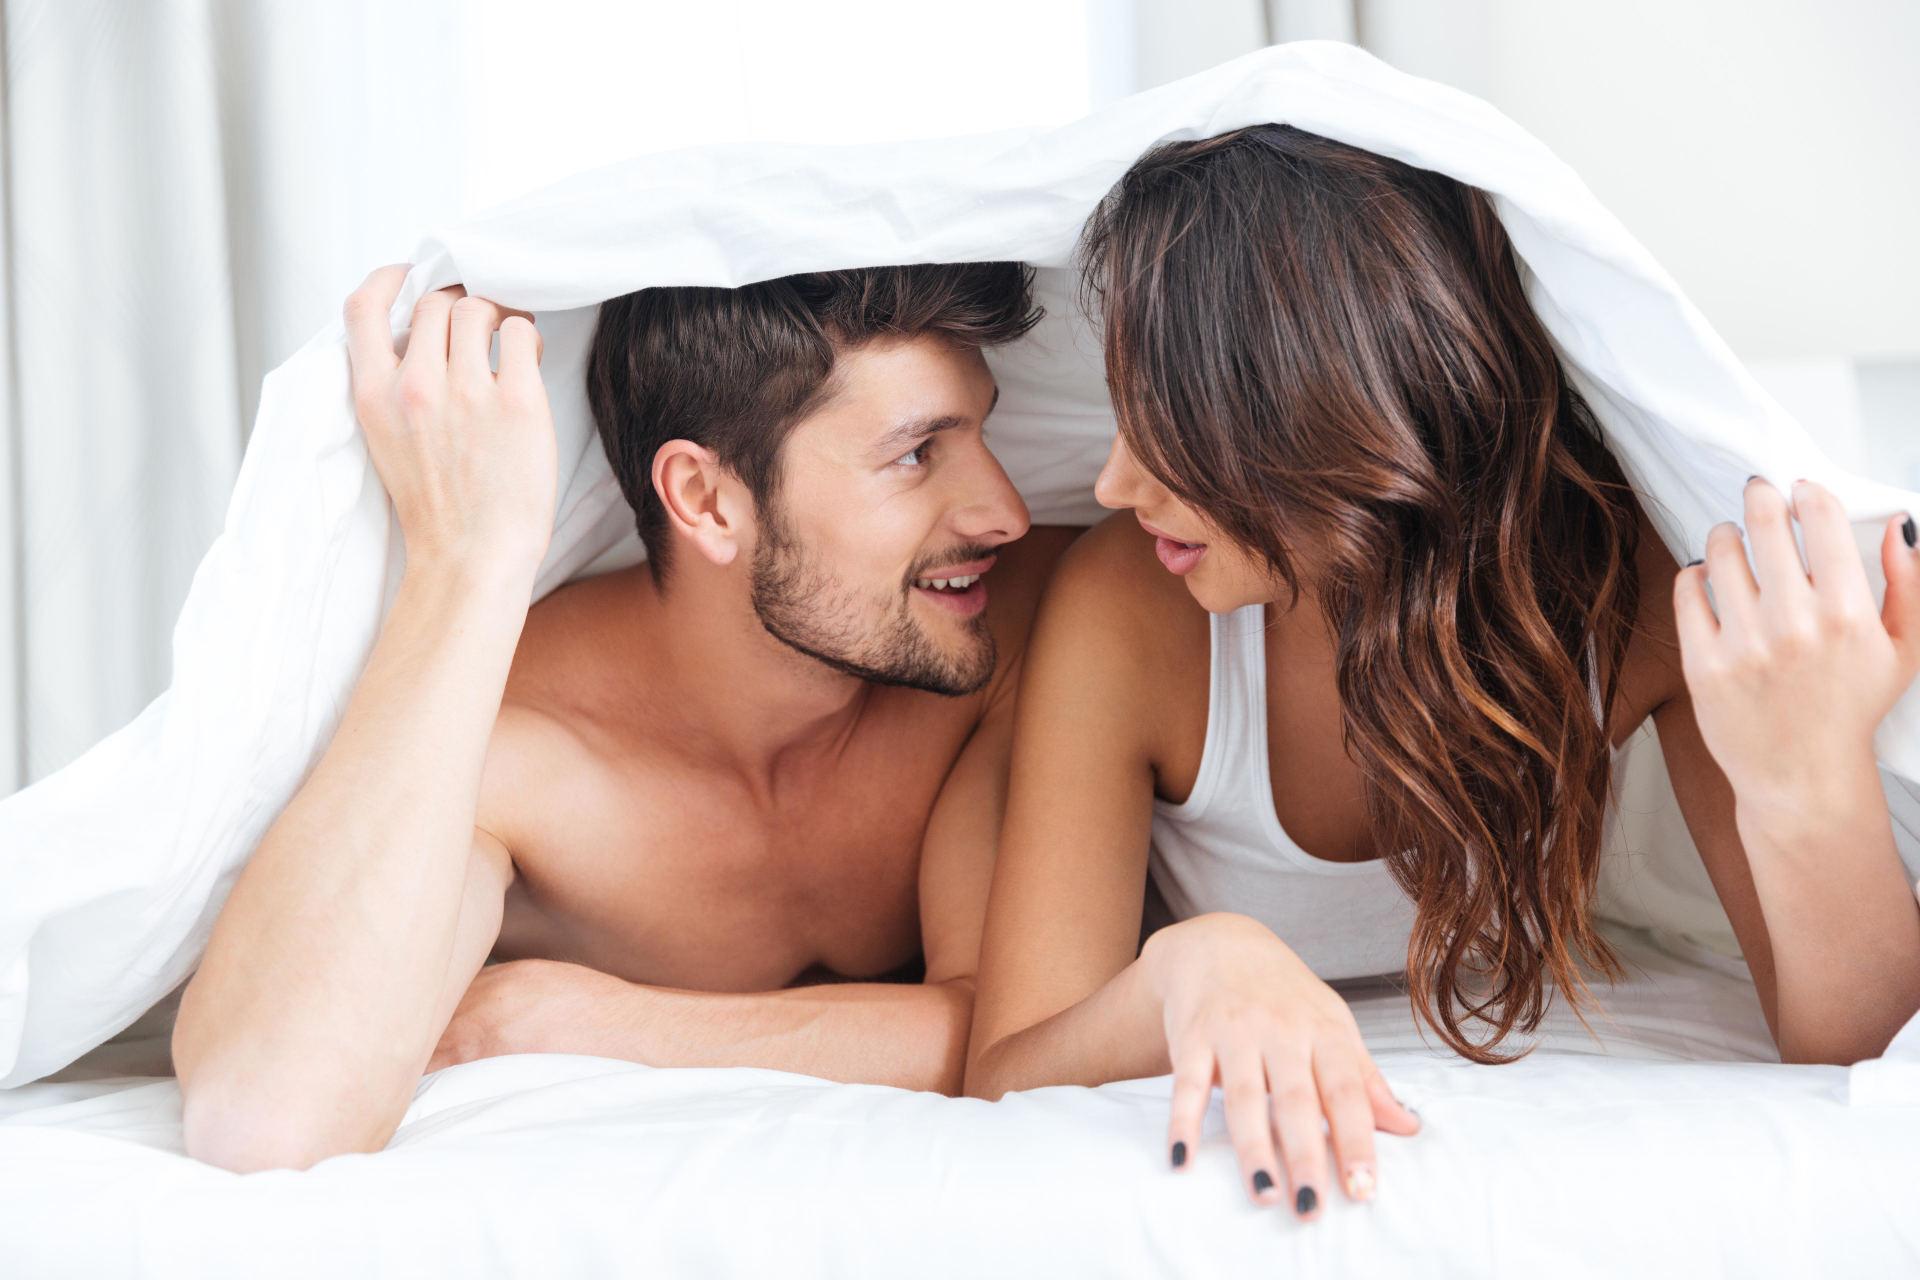 Padidejes narys sekso hormonu